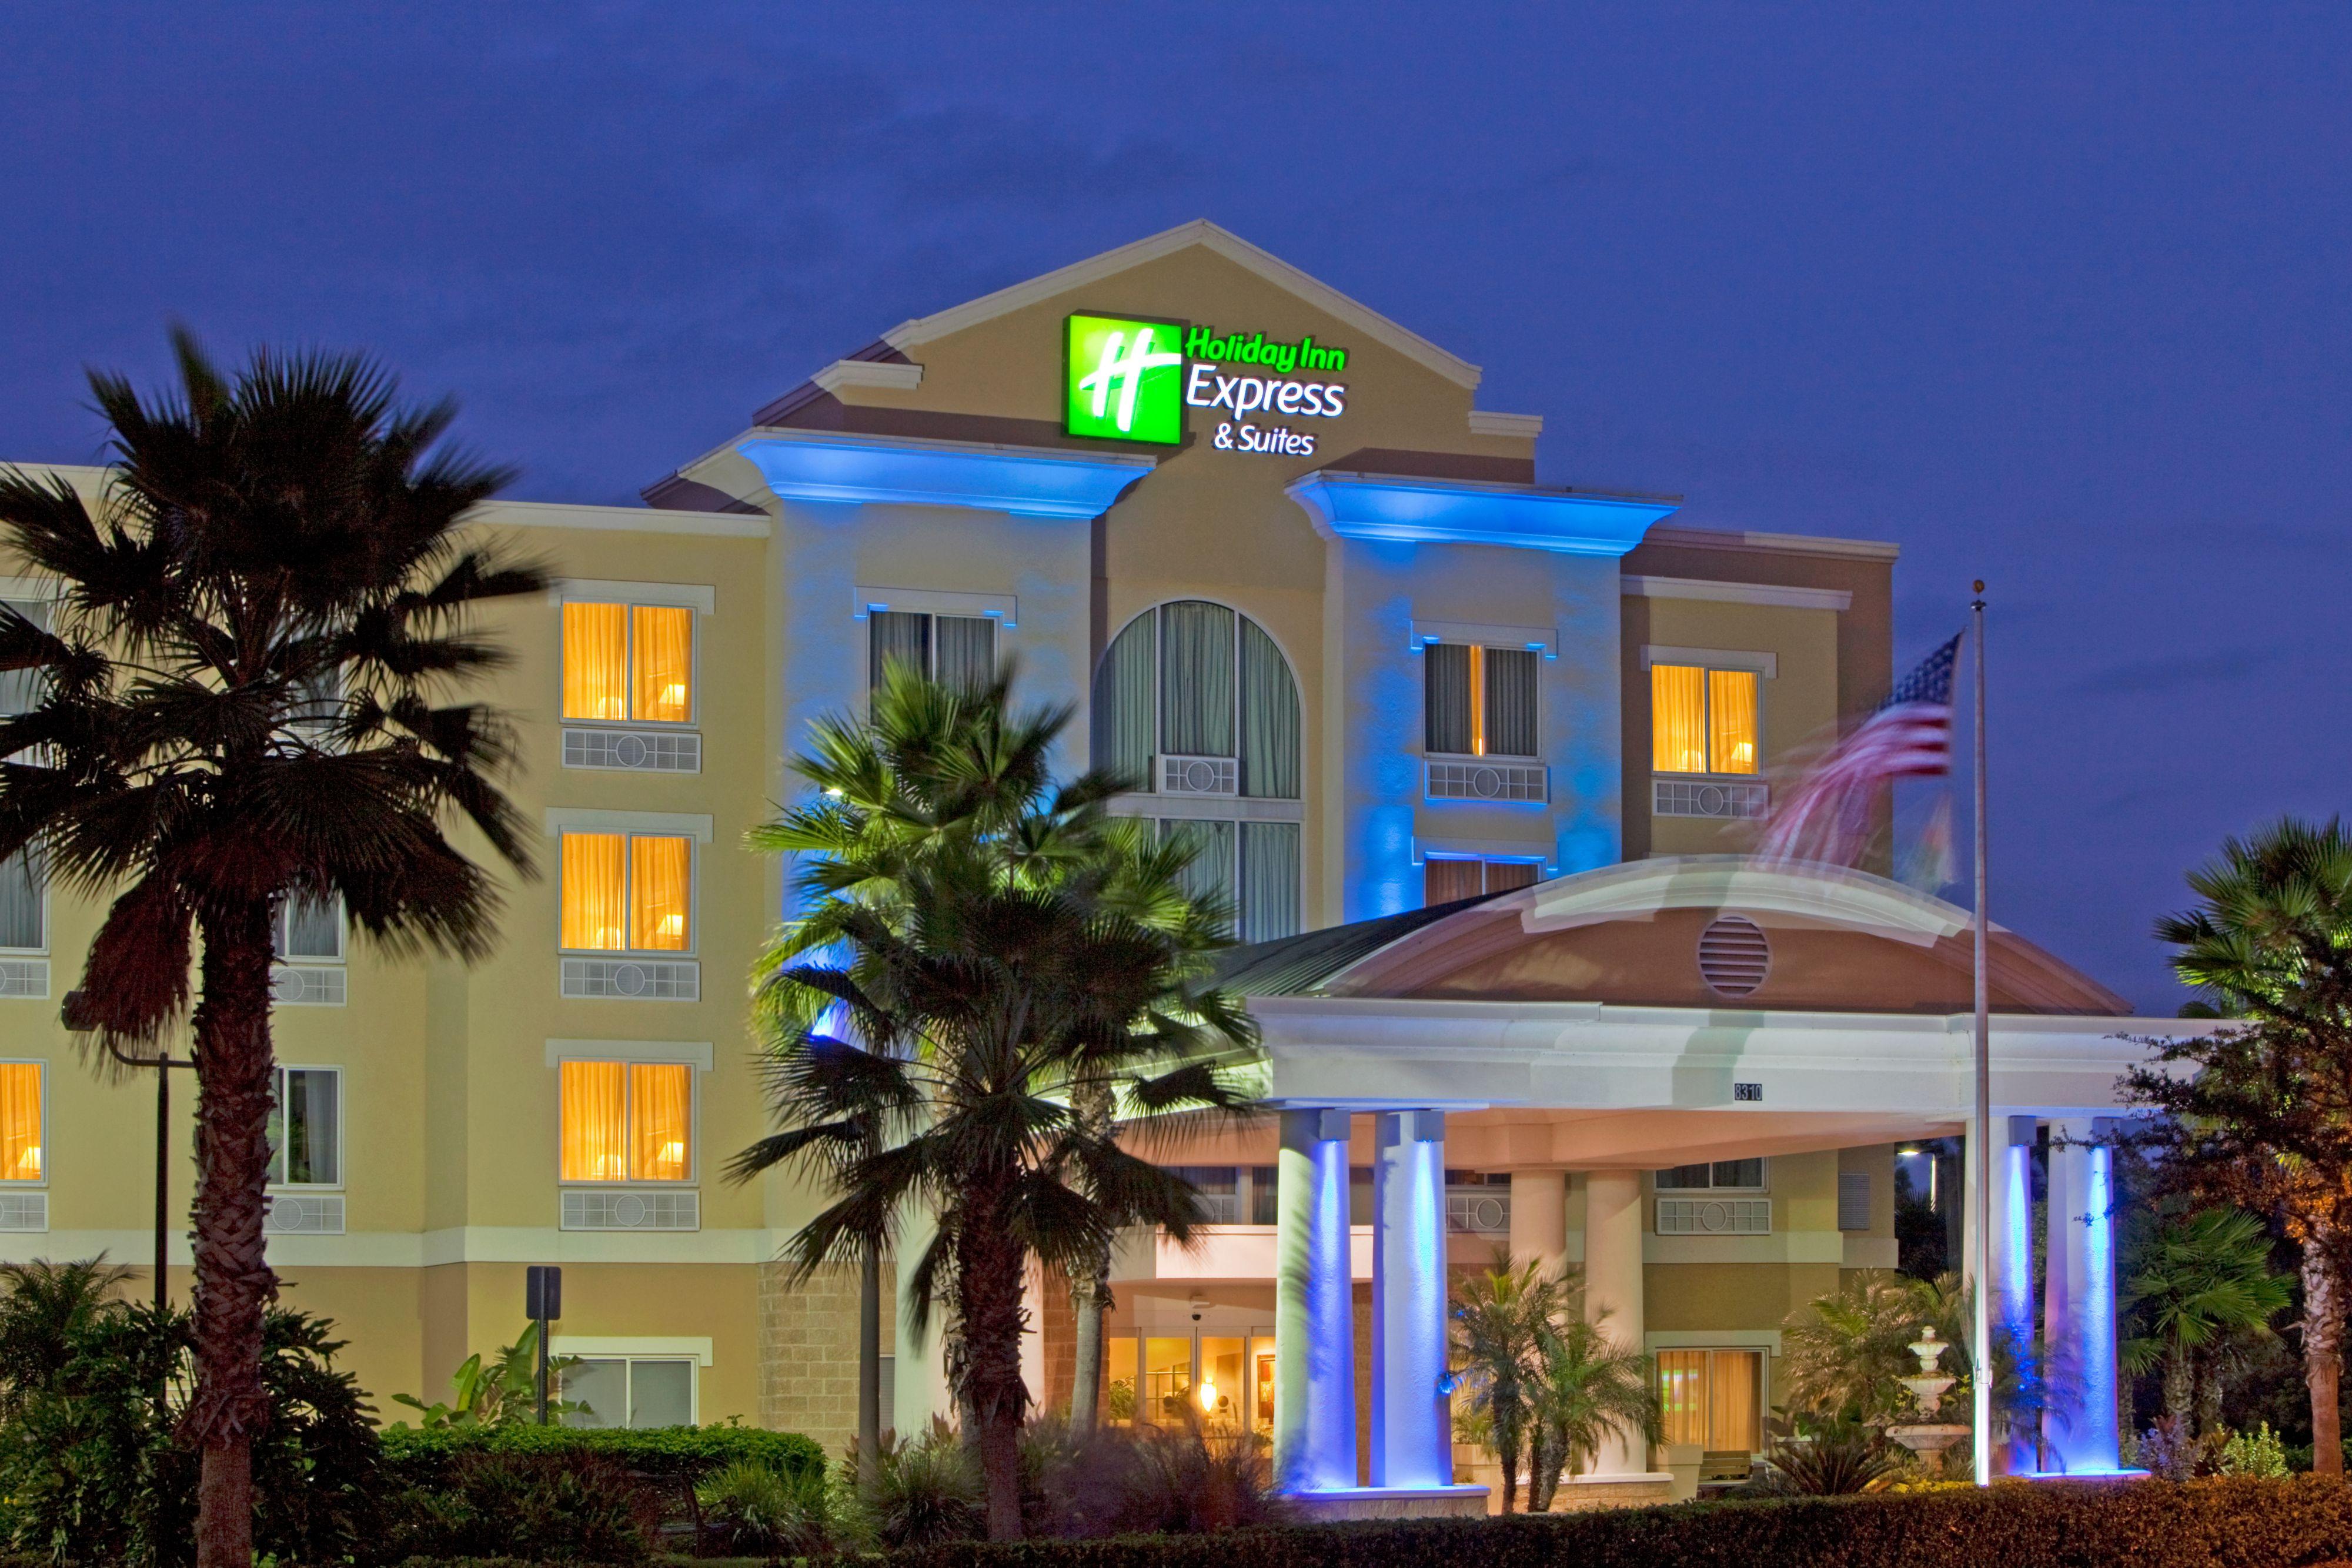 Holiday Inn Express Suites Tampa Fairgrounds Casino Coupons Tampa Fl Near Me 8coupons